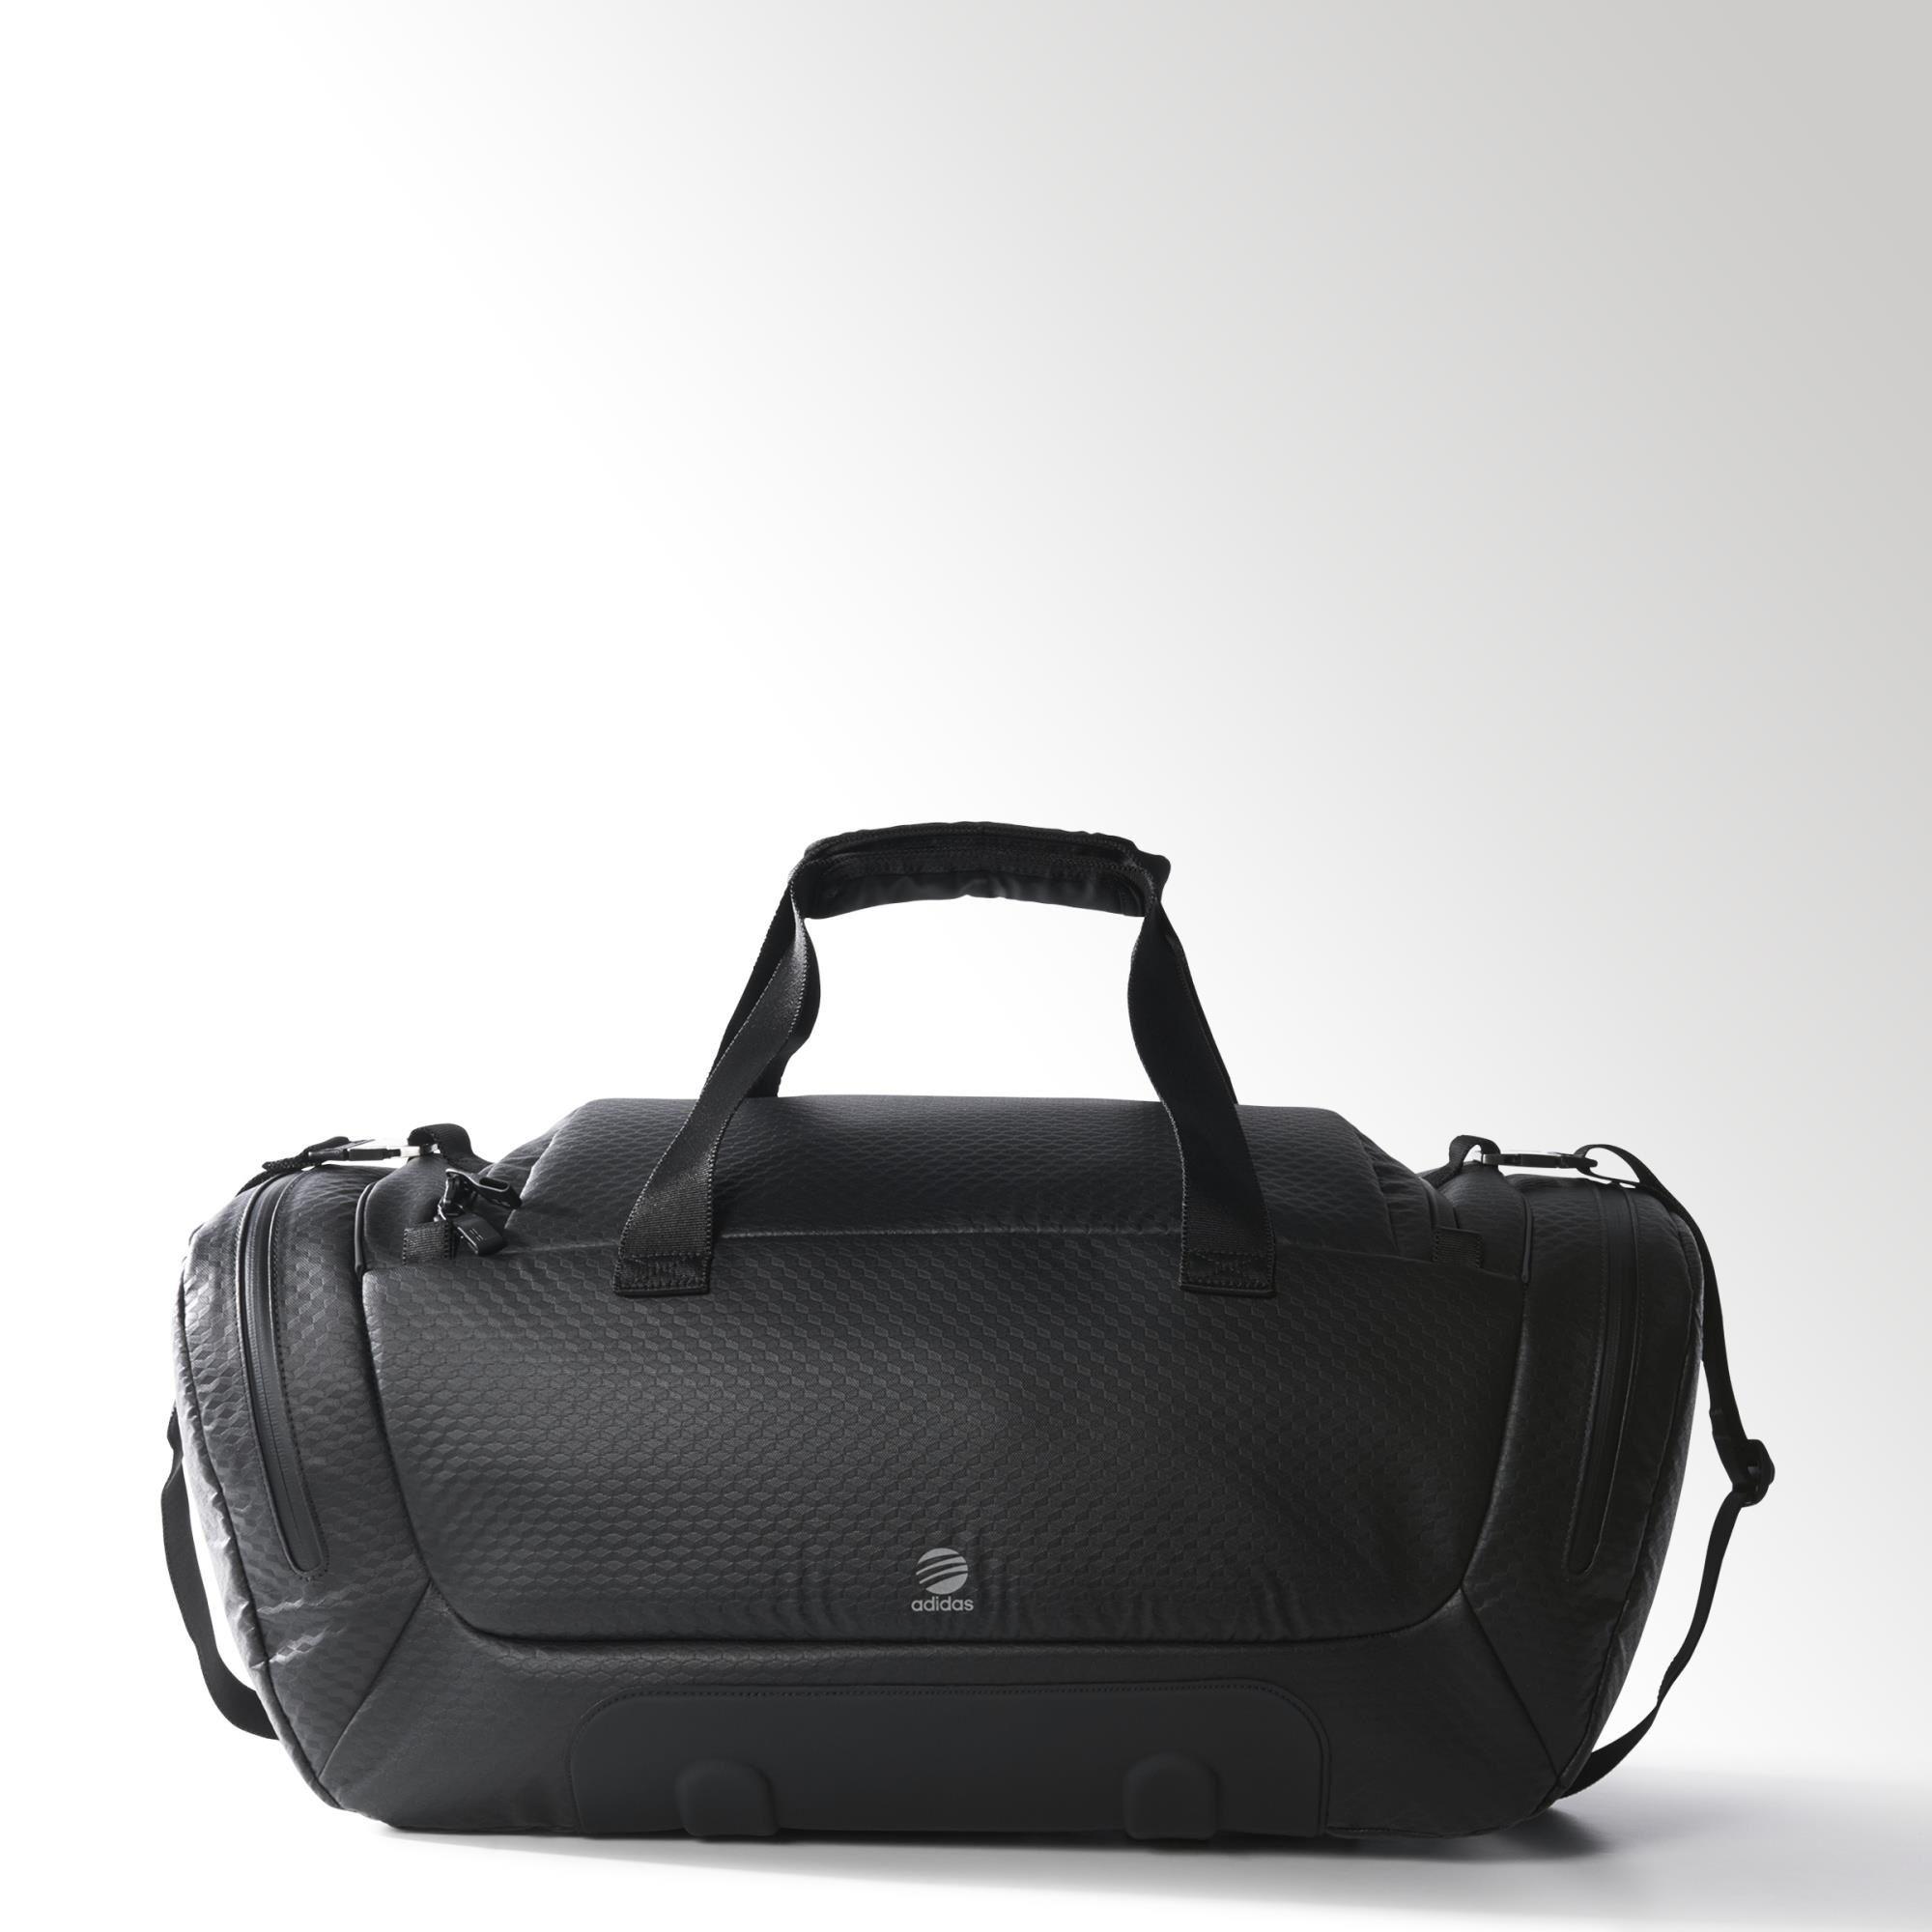 2b31a5aa2bc4 adidas Gym Team Bag